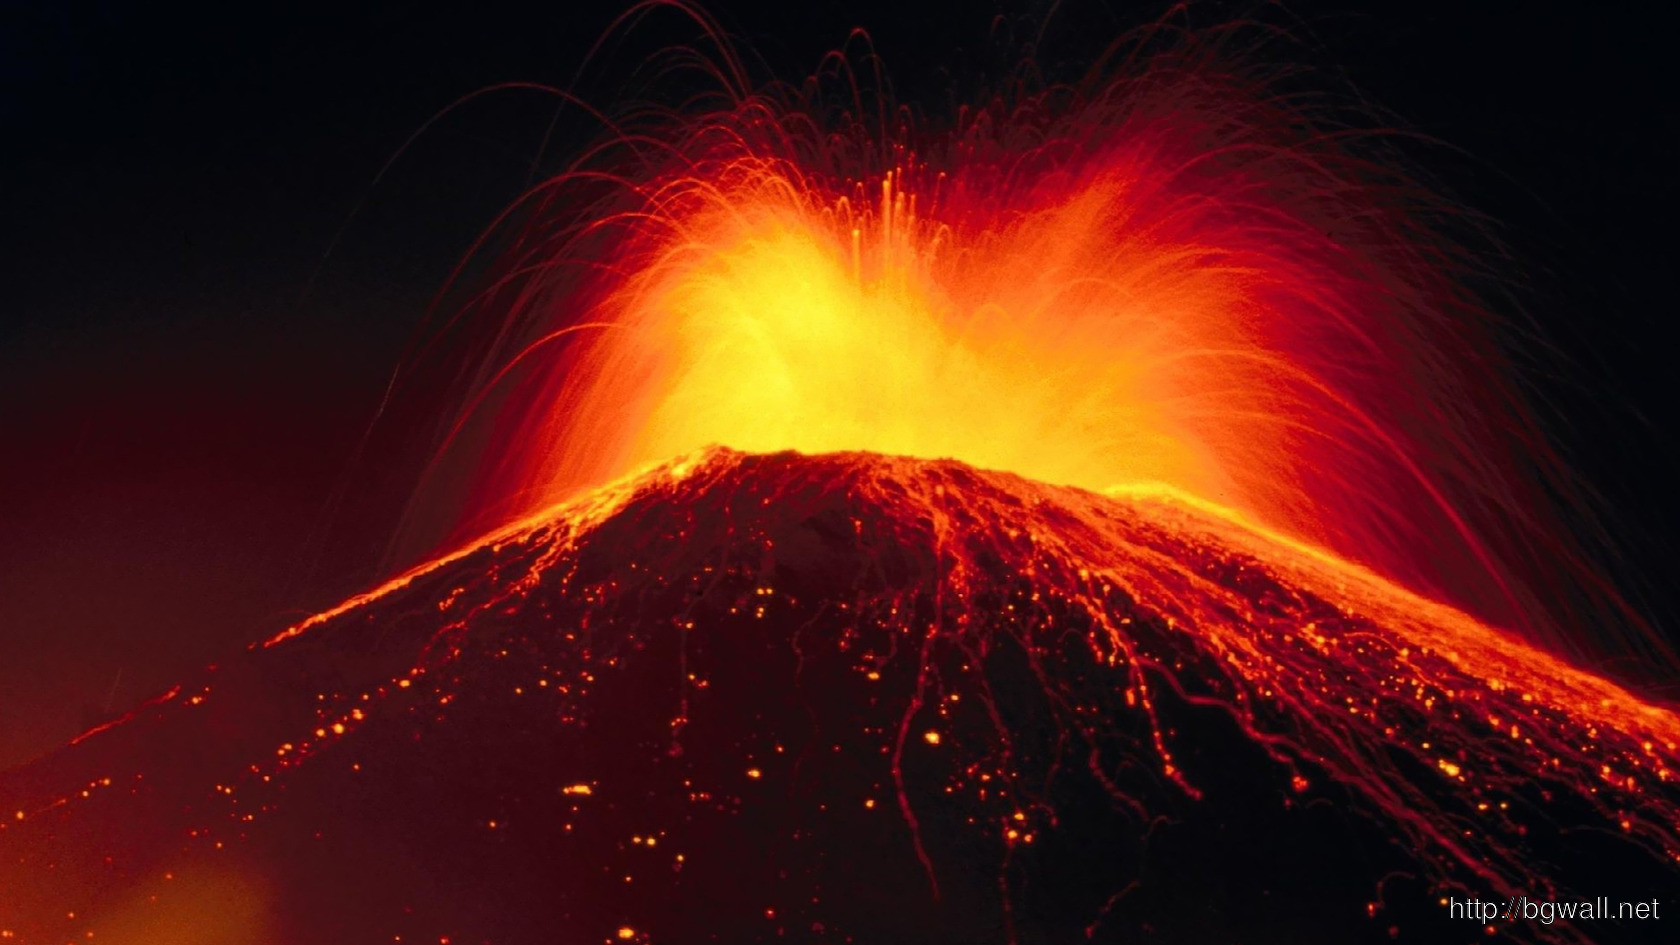 Erupting Volcano Wallpaper 9497 Full Size